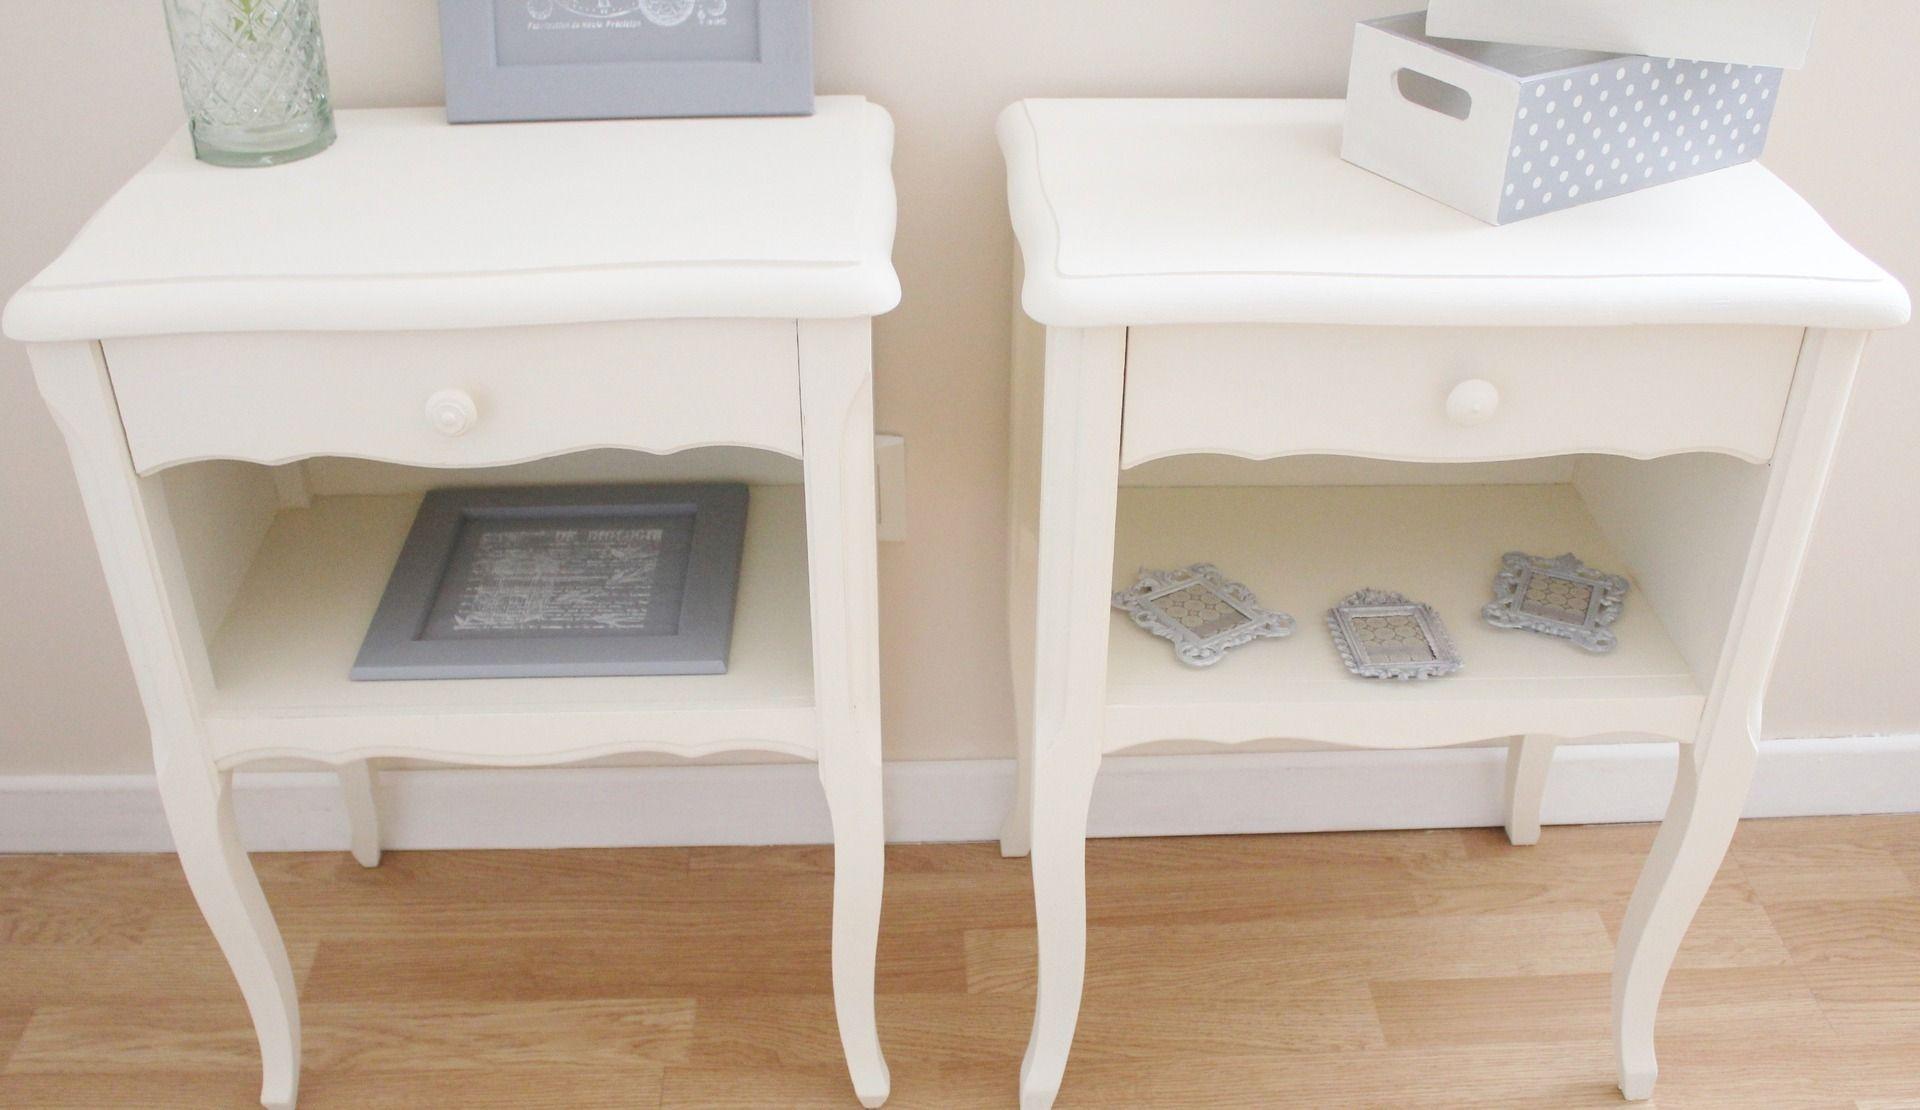 Tables de chevet ivoire style shabby chic meubles et rangements par aufonddemongrenier - Meuble style shabby ...